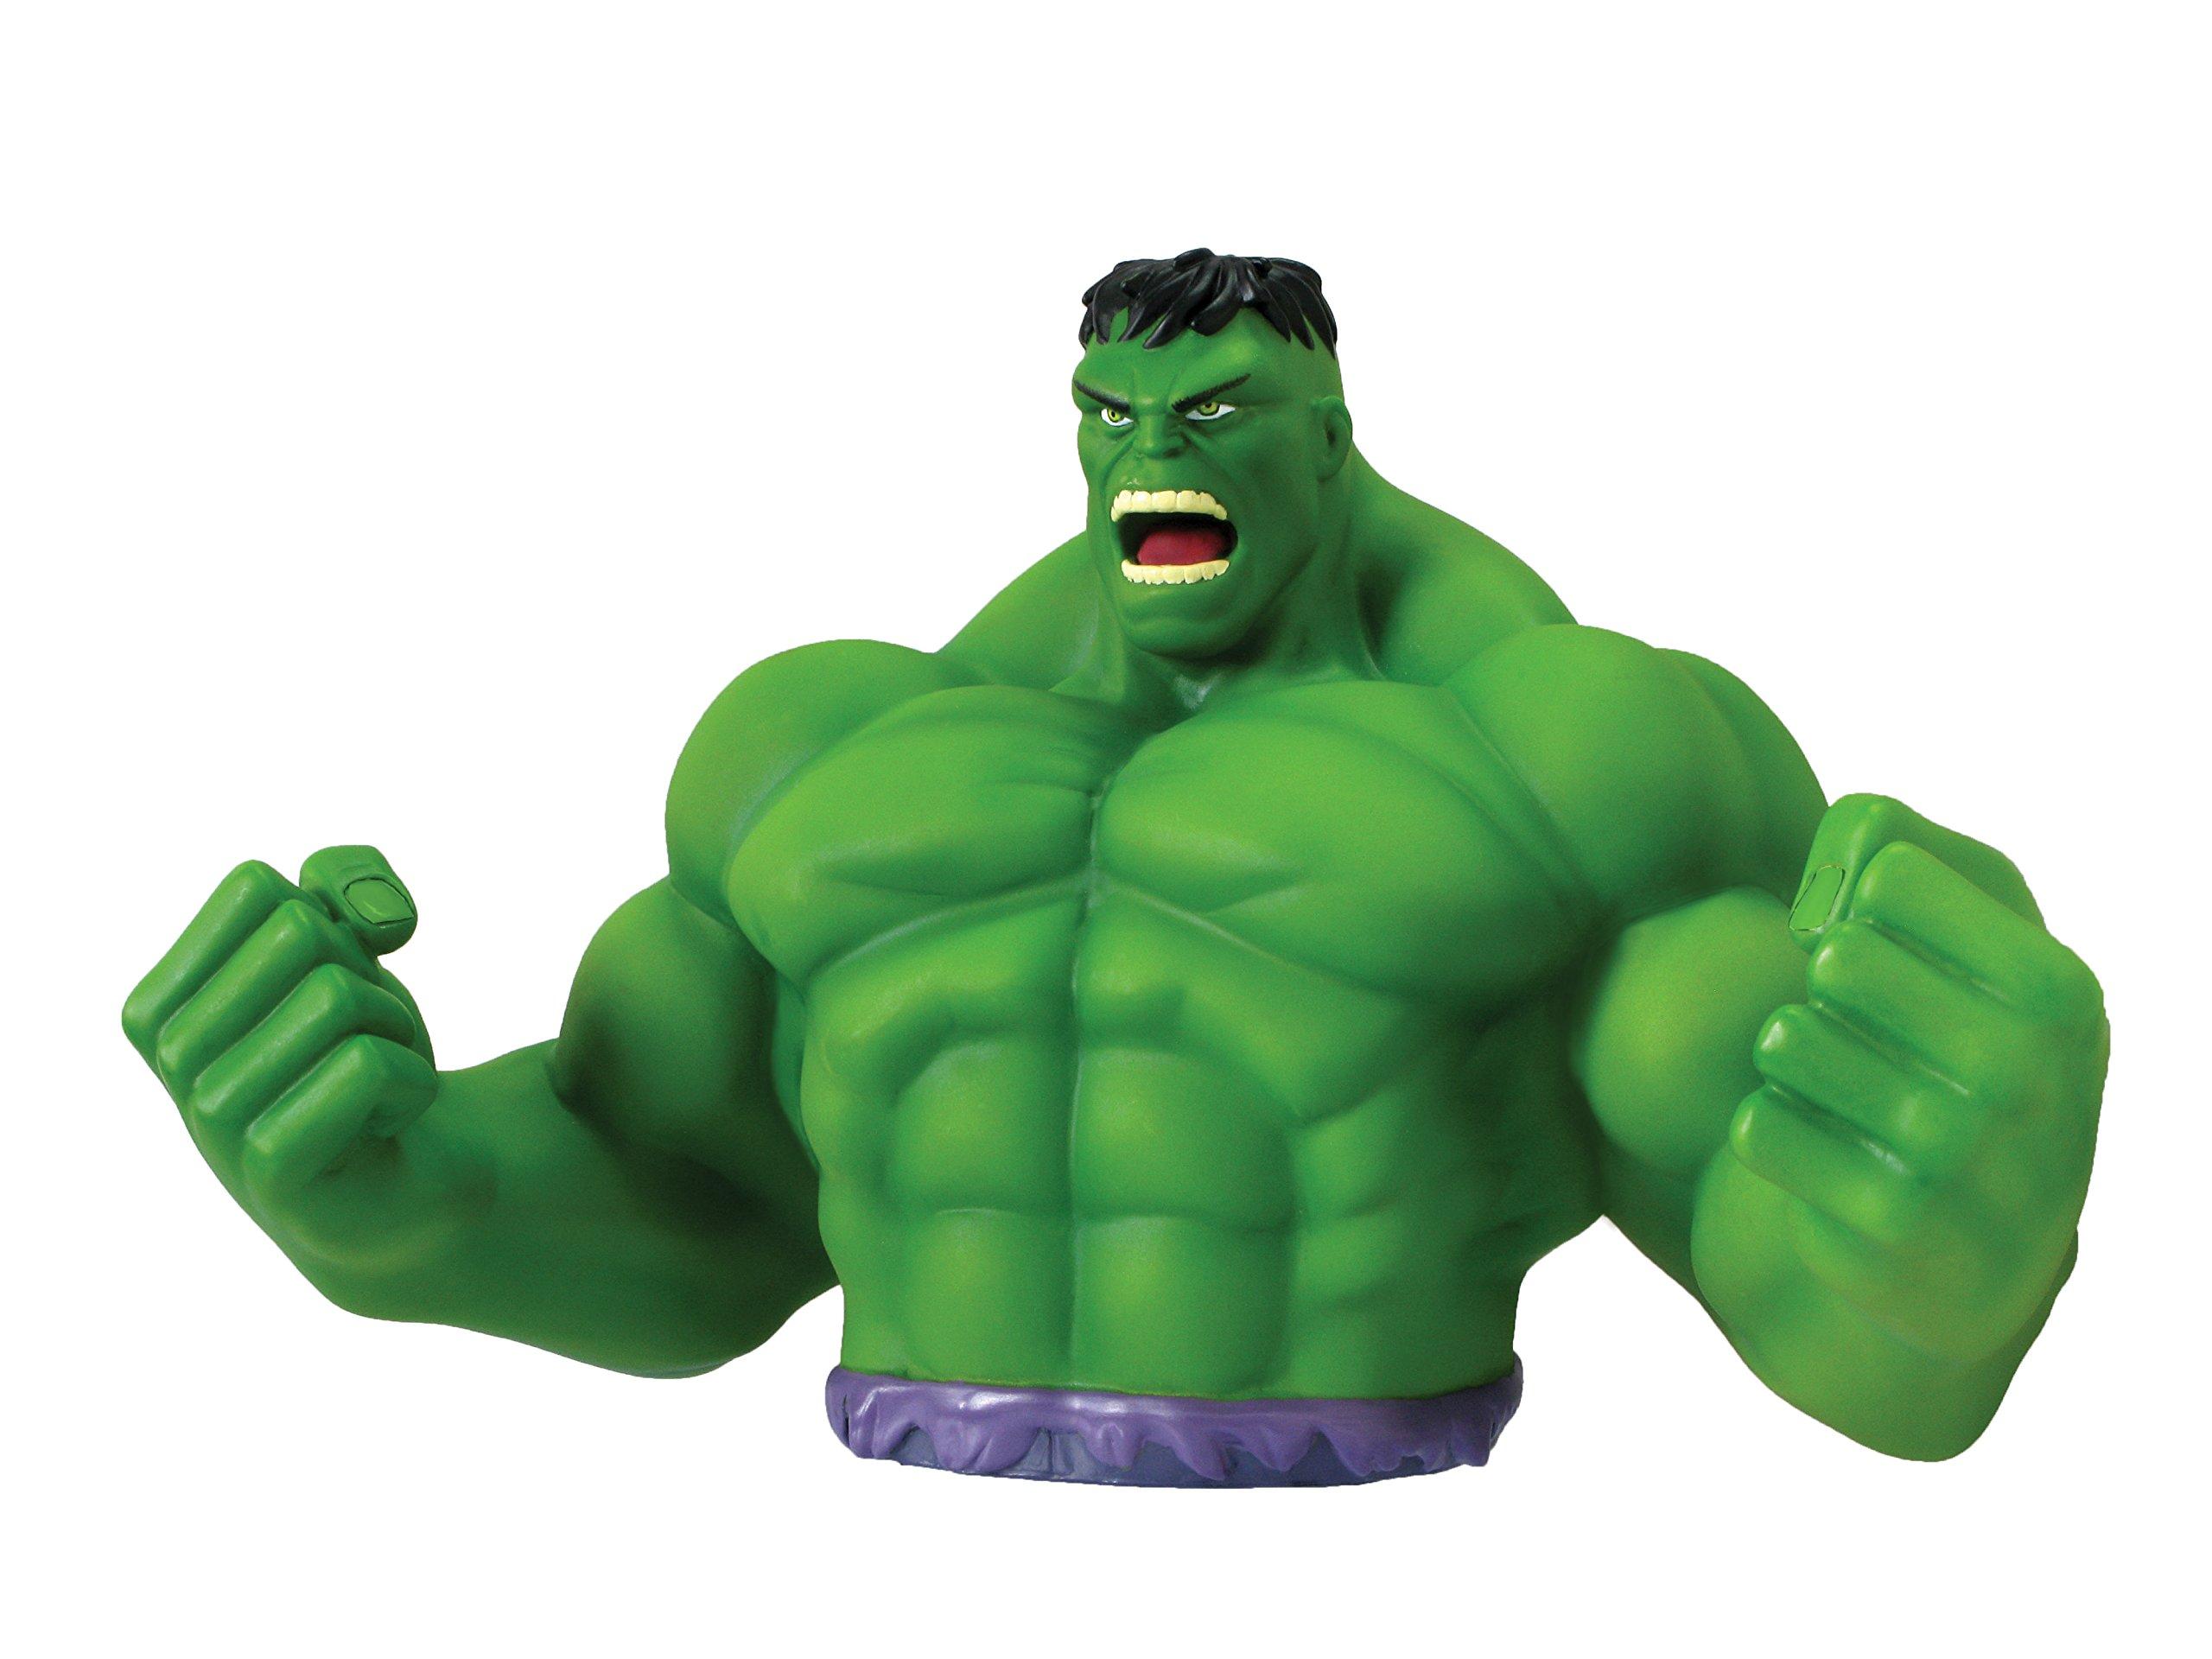 Marvel Hulk Bust Bank - Green Action Figure by Marvel